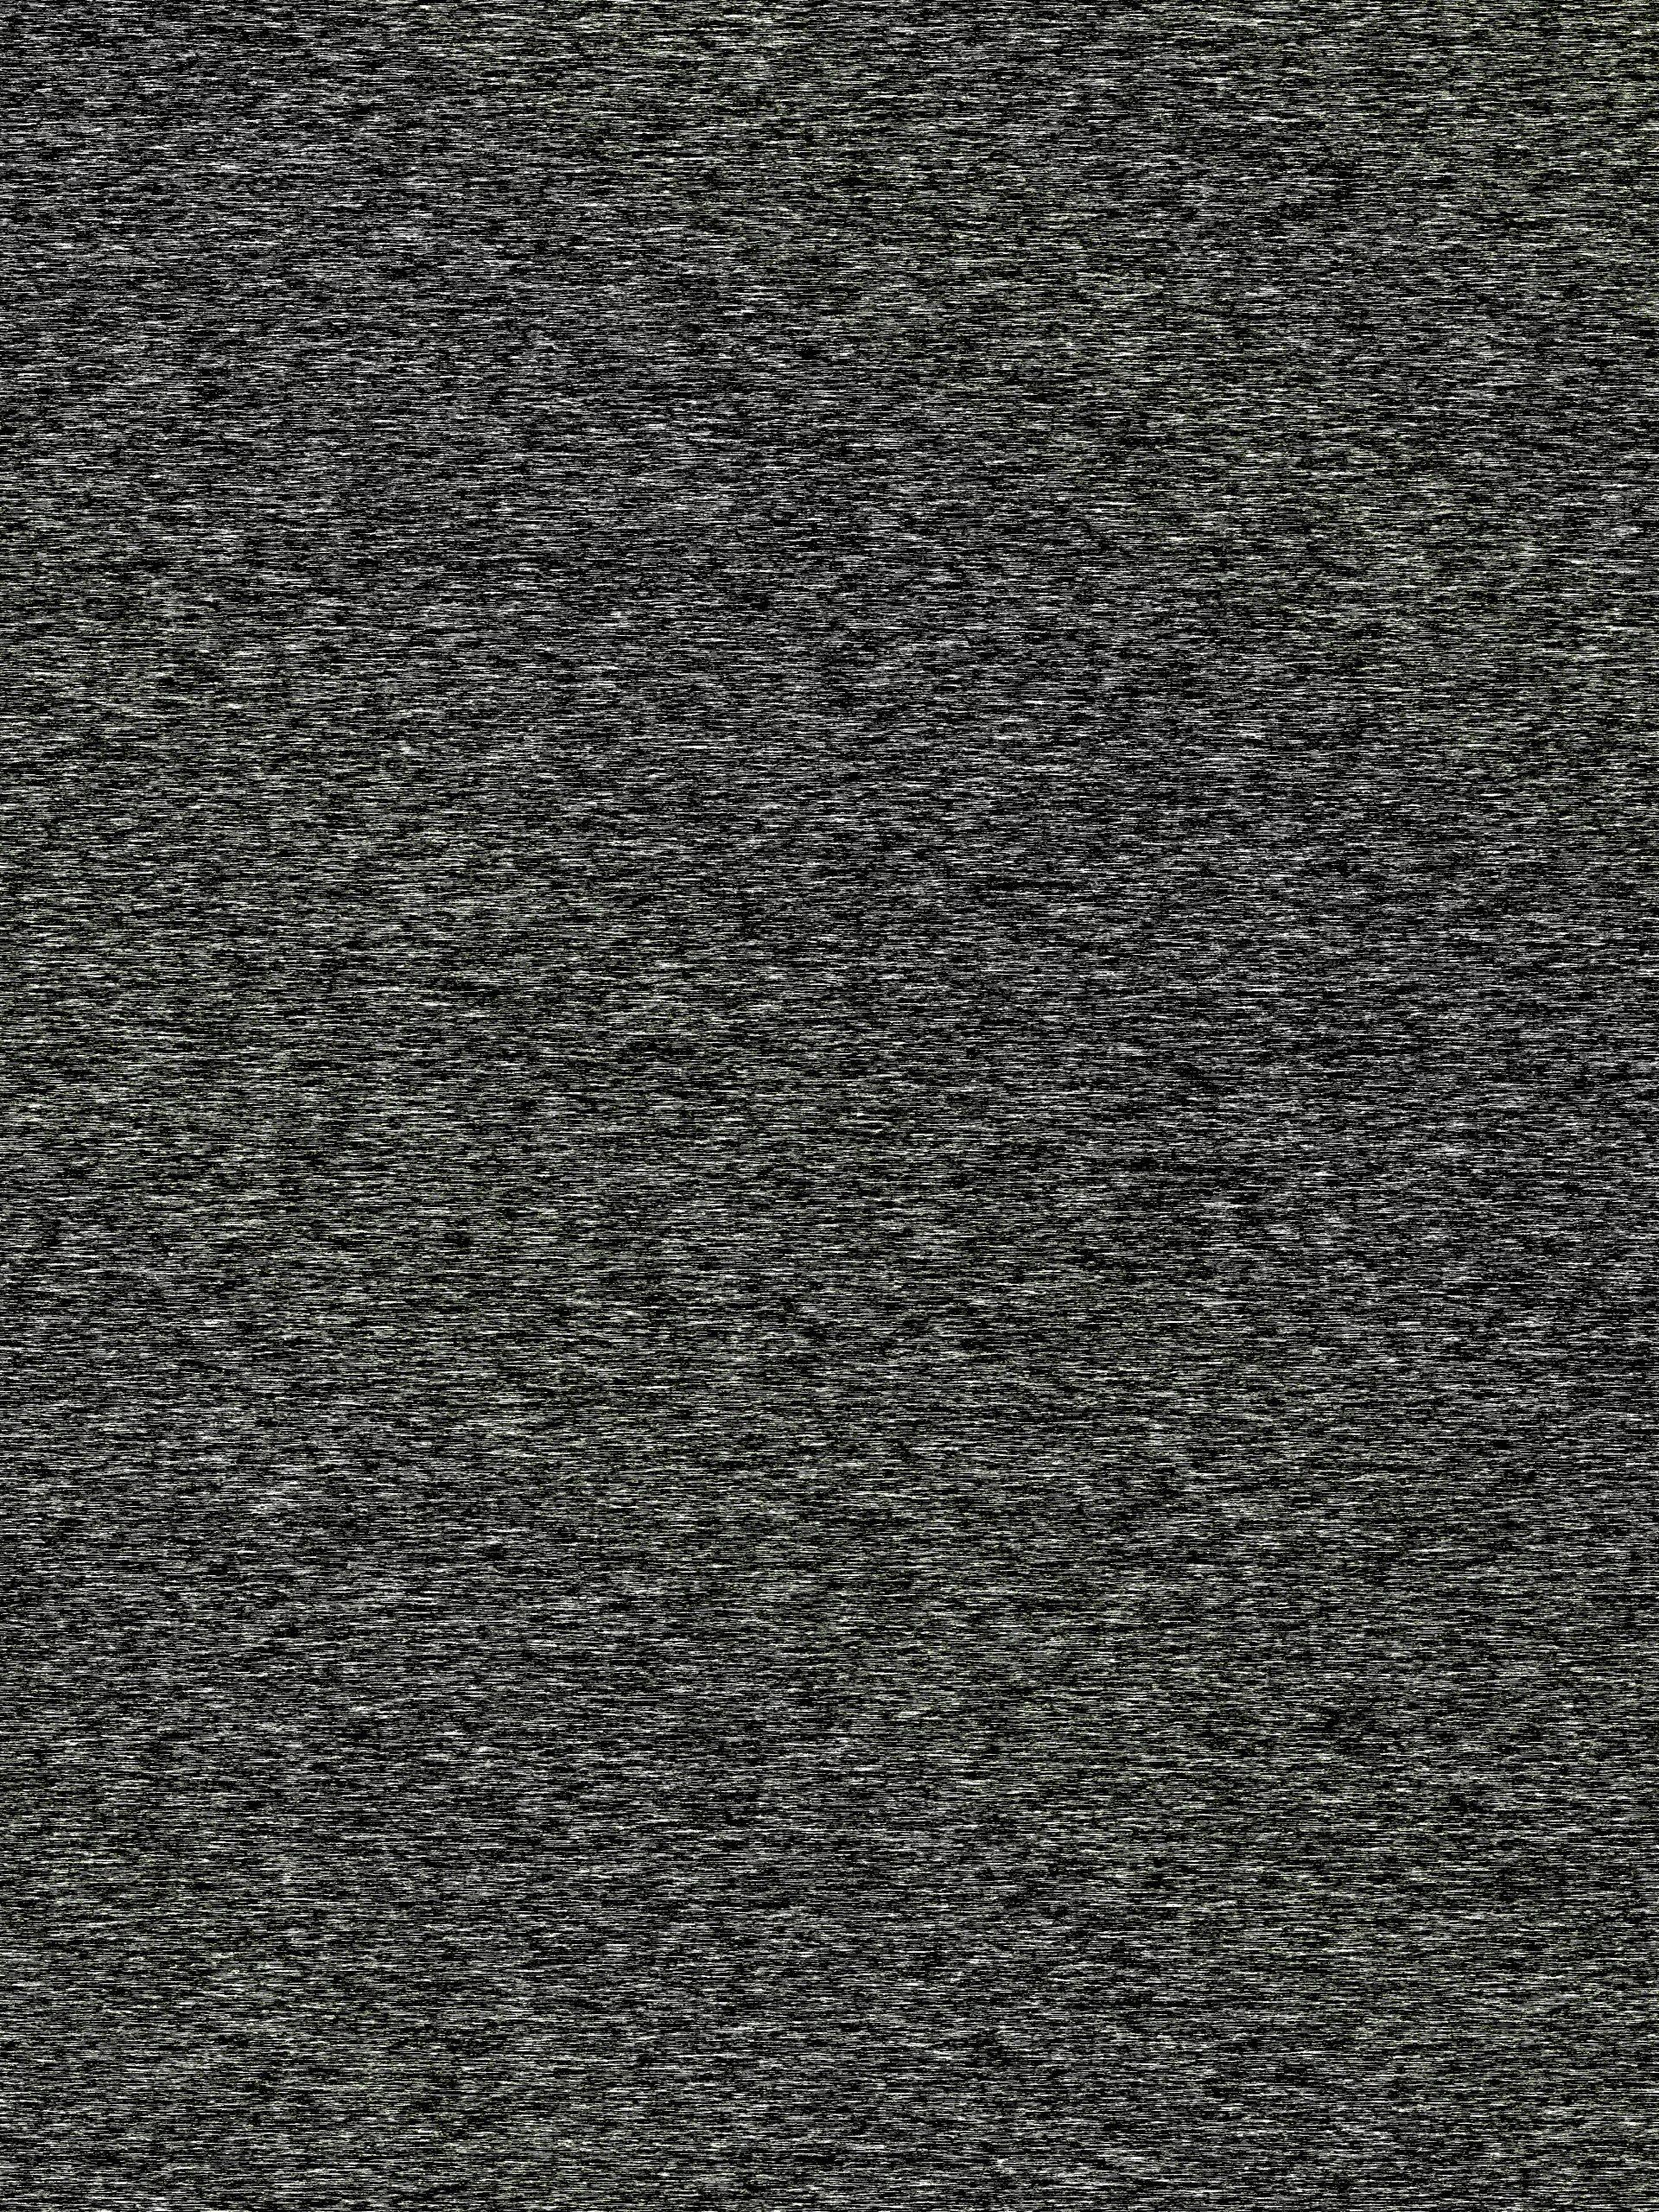 Black surface wallpaper